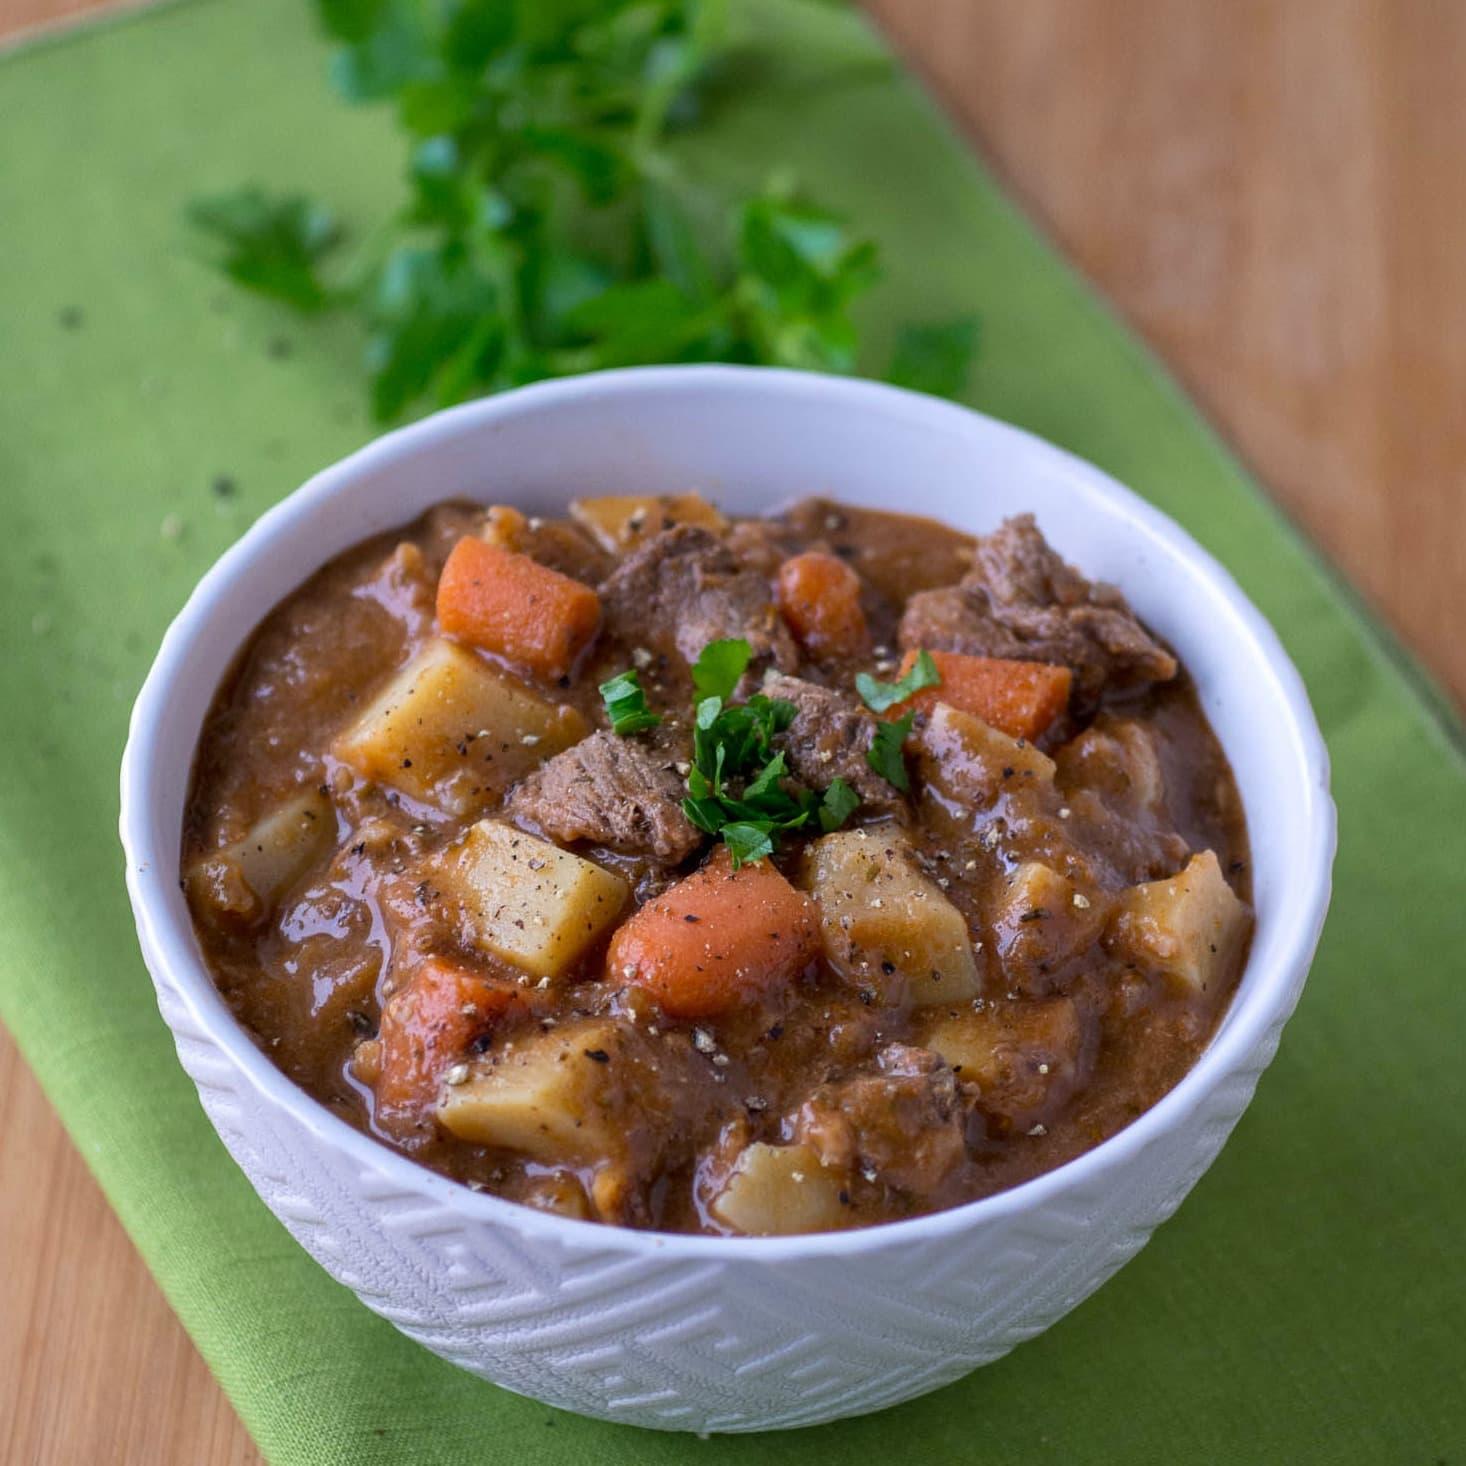 Bowl of Irish Lamb Stew with Guinness